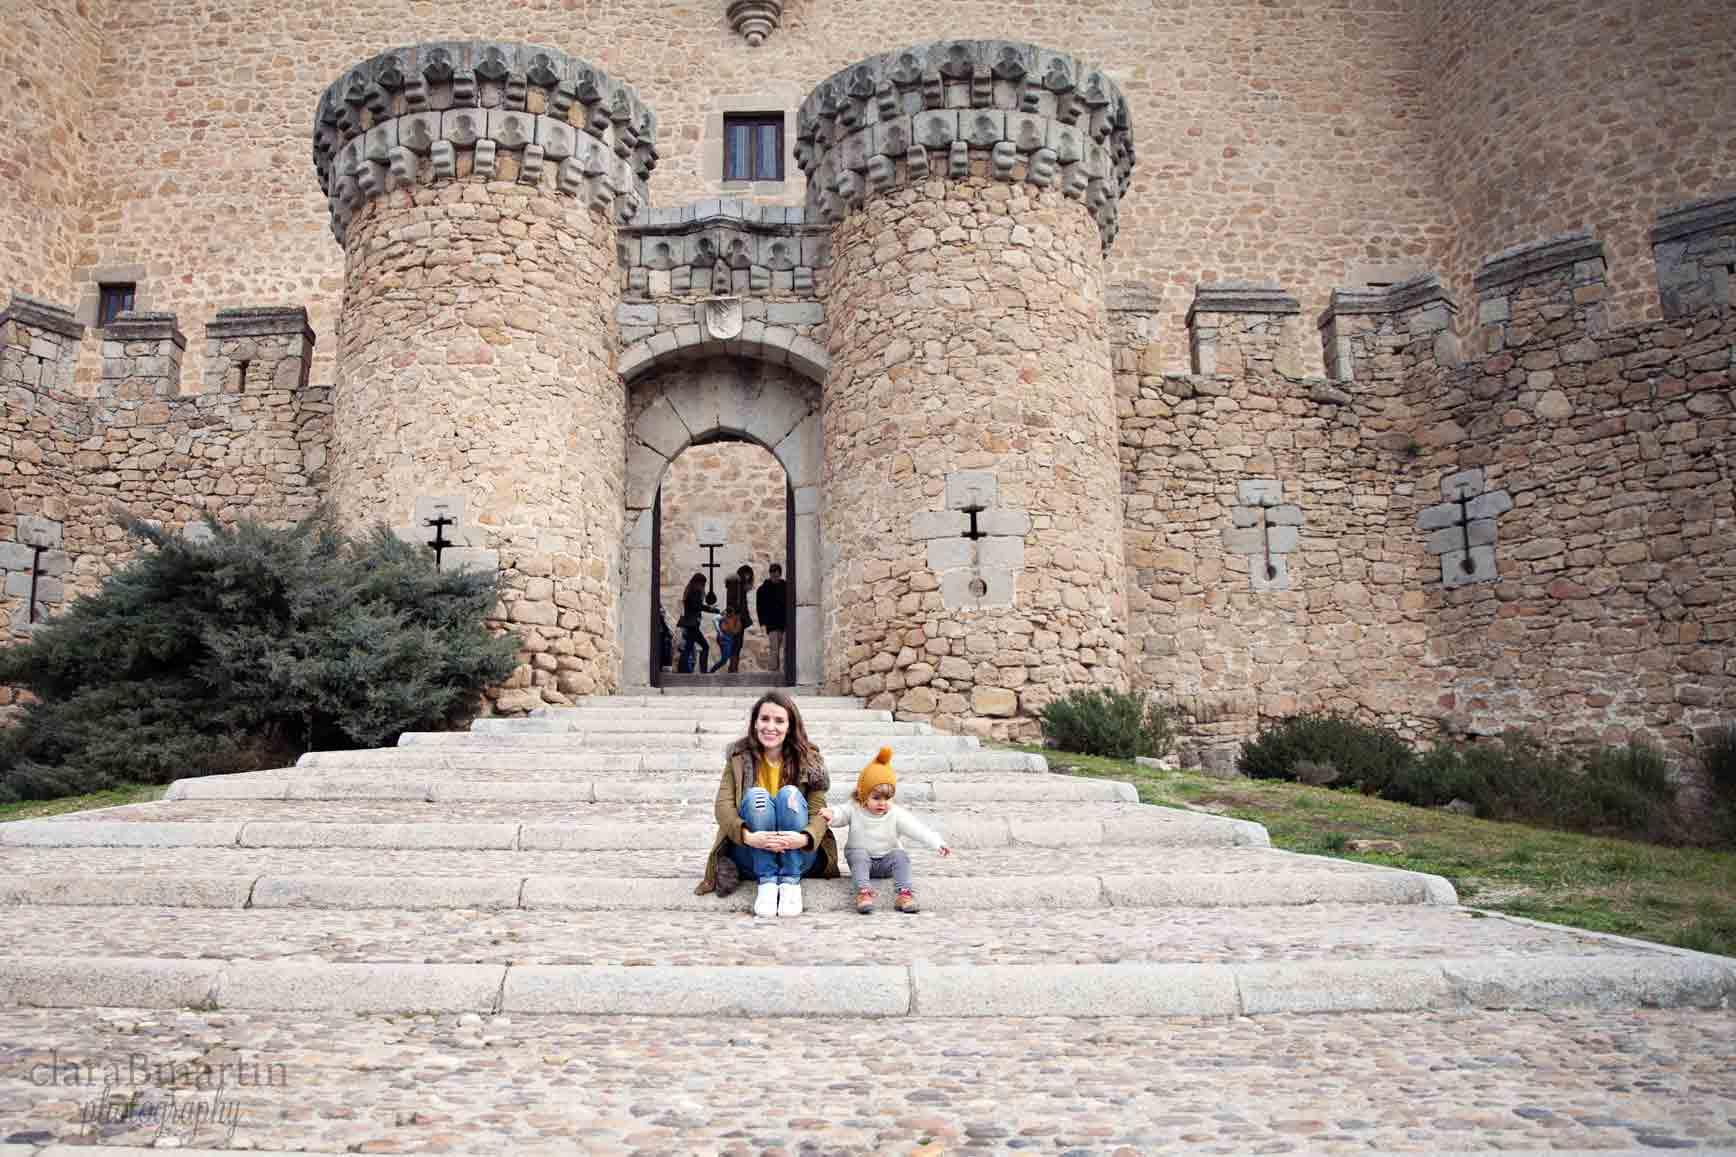 Castillo-Manzanares-El-Real-claraBmartin-03